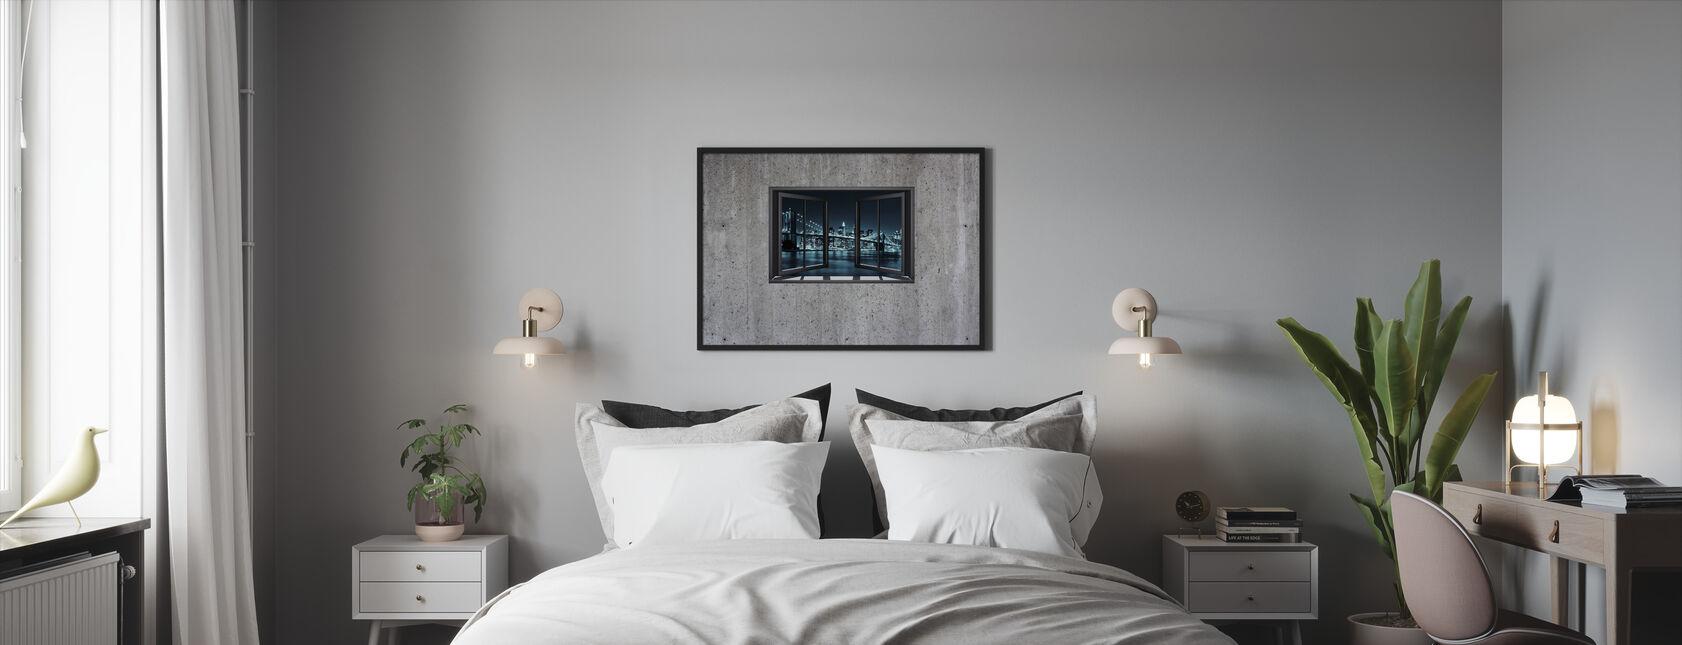 Window on Concrete Wall Brooklyn - Framed print - Bedroom